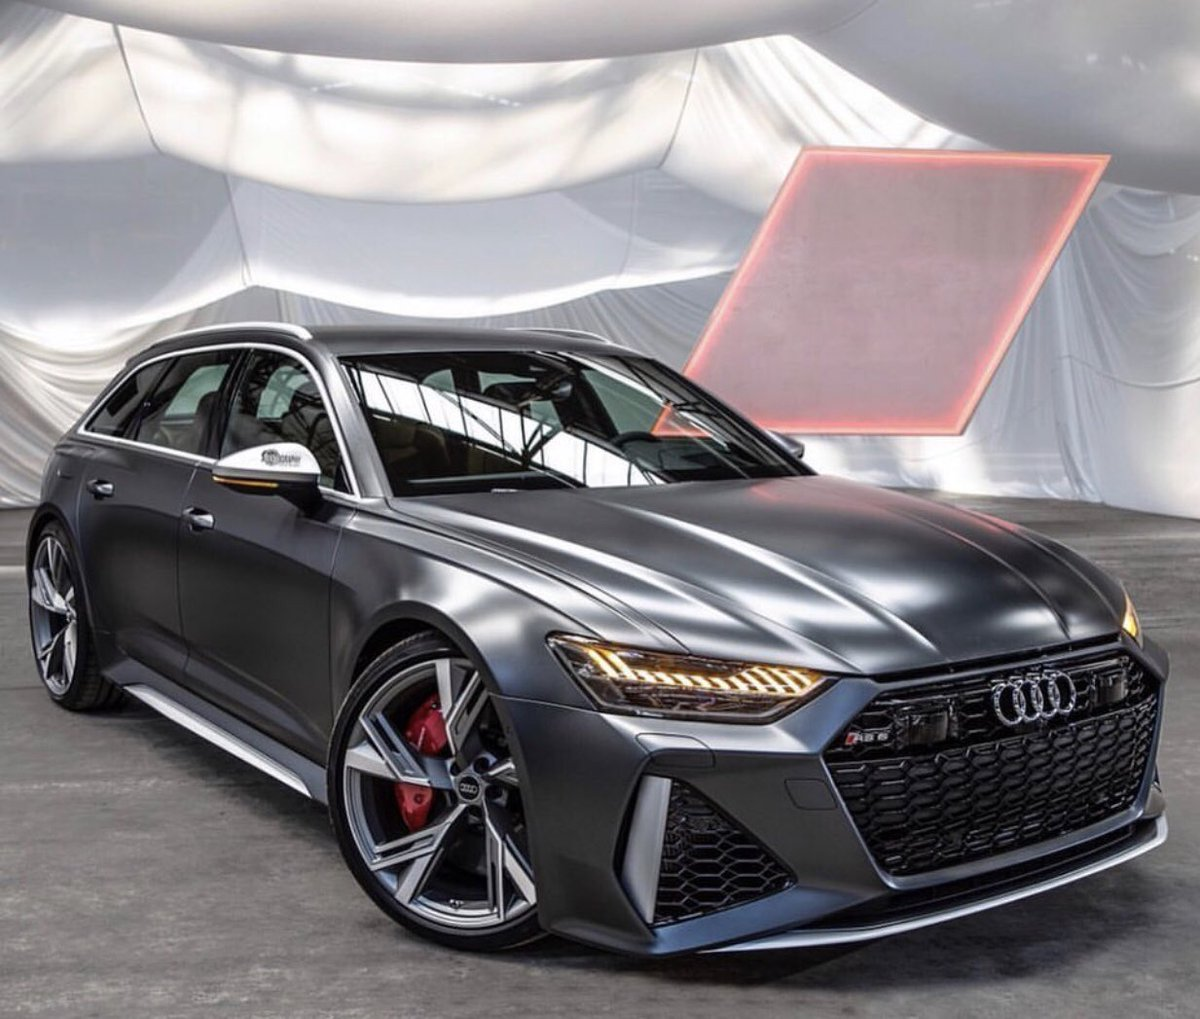 New 2020 Audi RS6 <br>http://pic.twitter.com/l7rslwoe8L